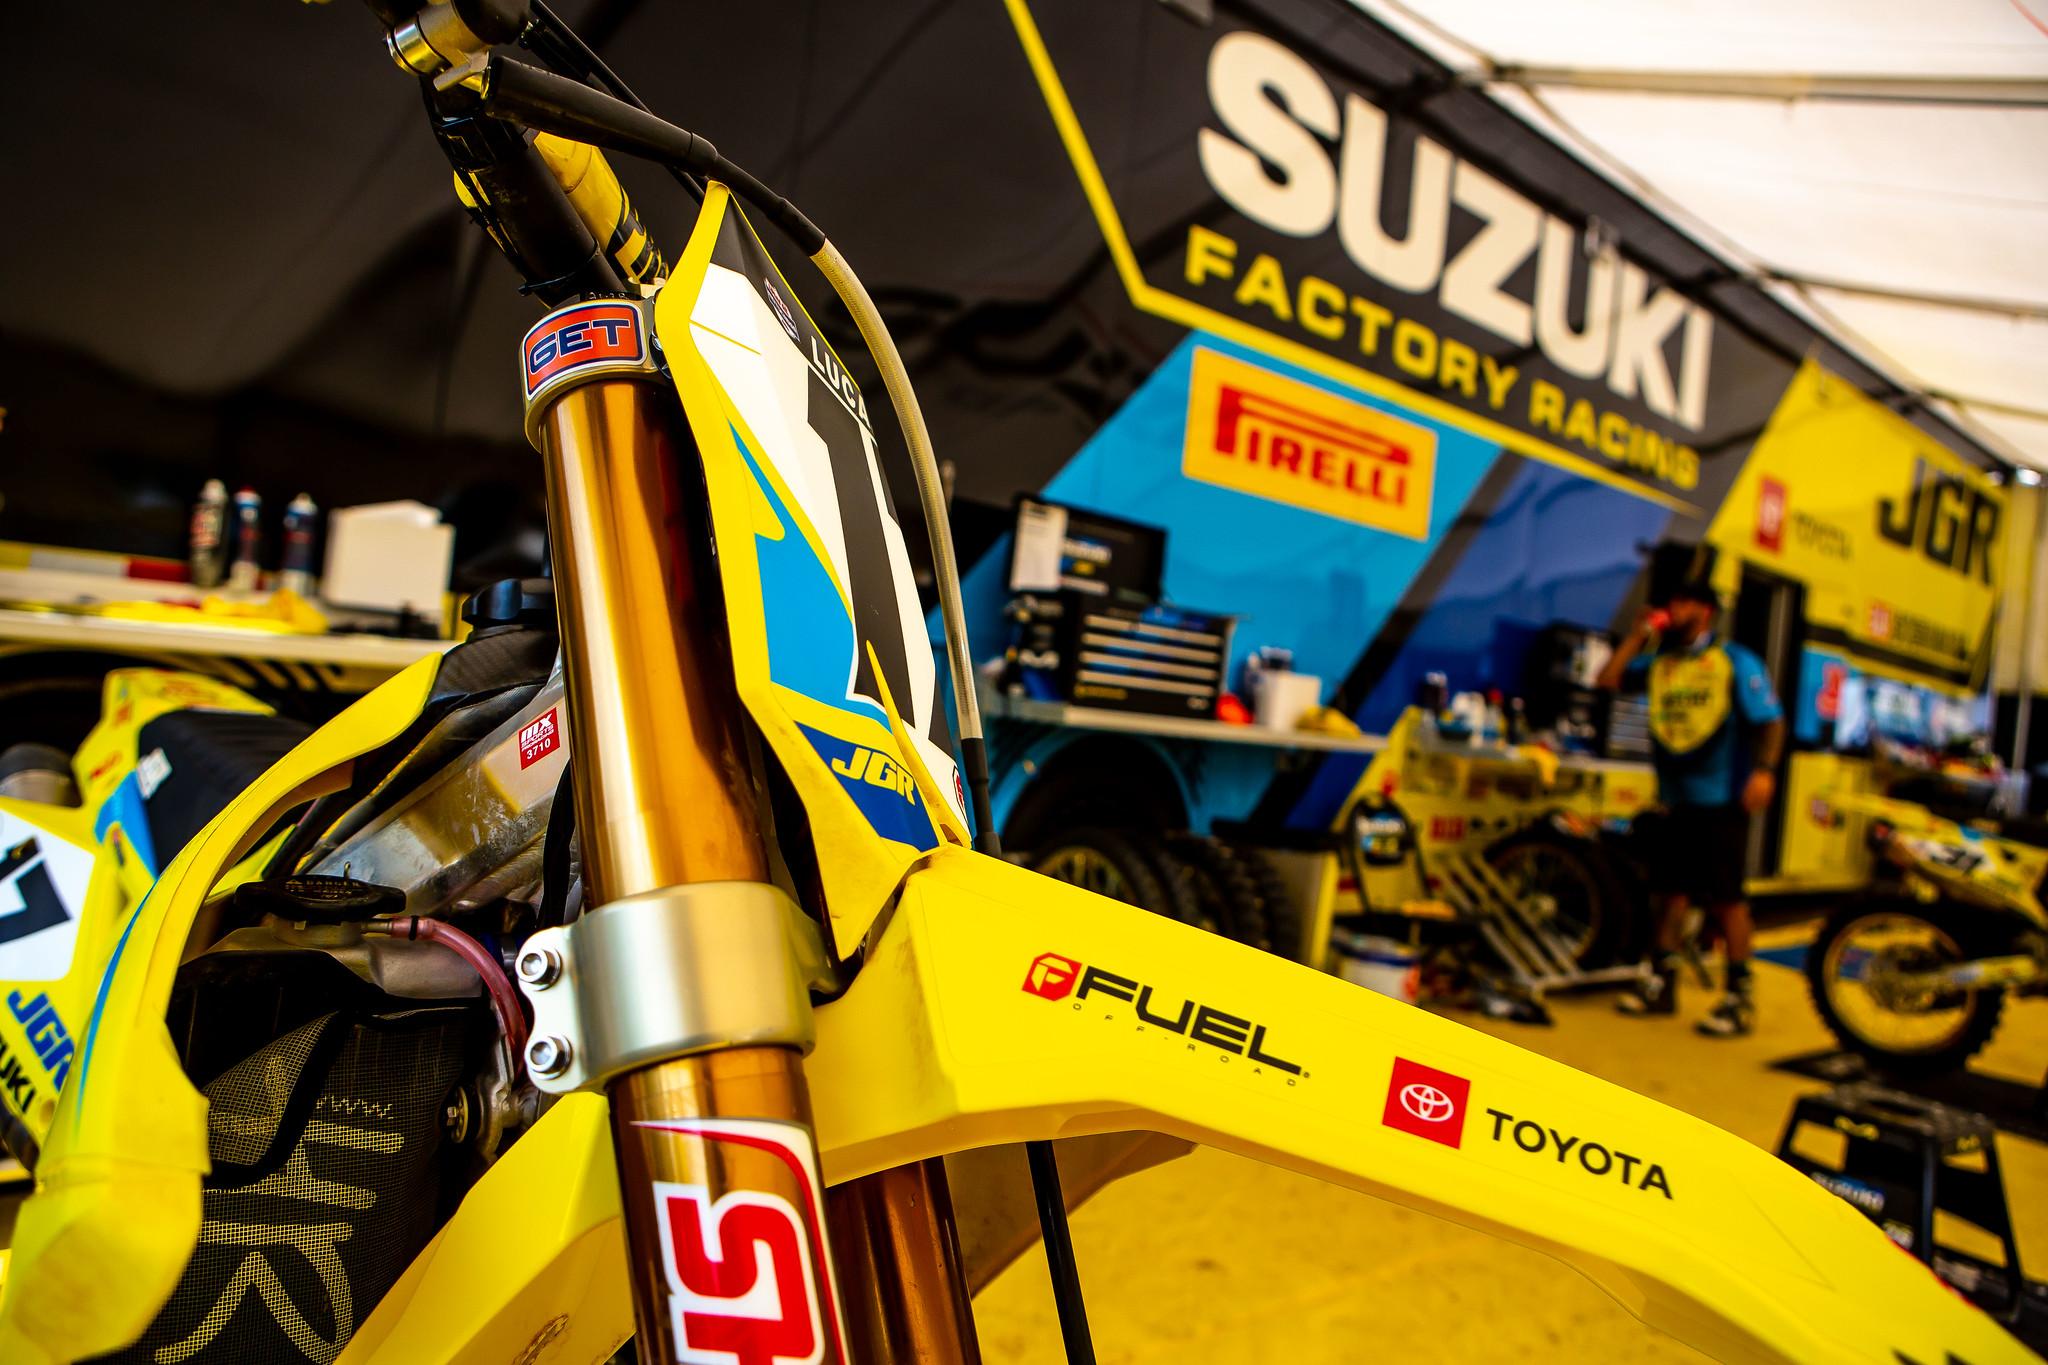 200817 The JGRMX:Yoshimura:Suzuki Racing Team returns for round 2 at Loretta Lynn's Ranch next weekend